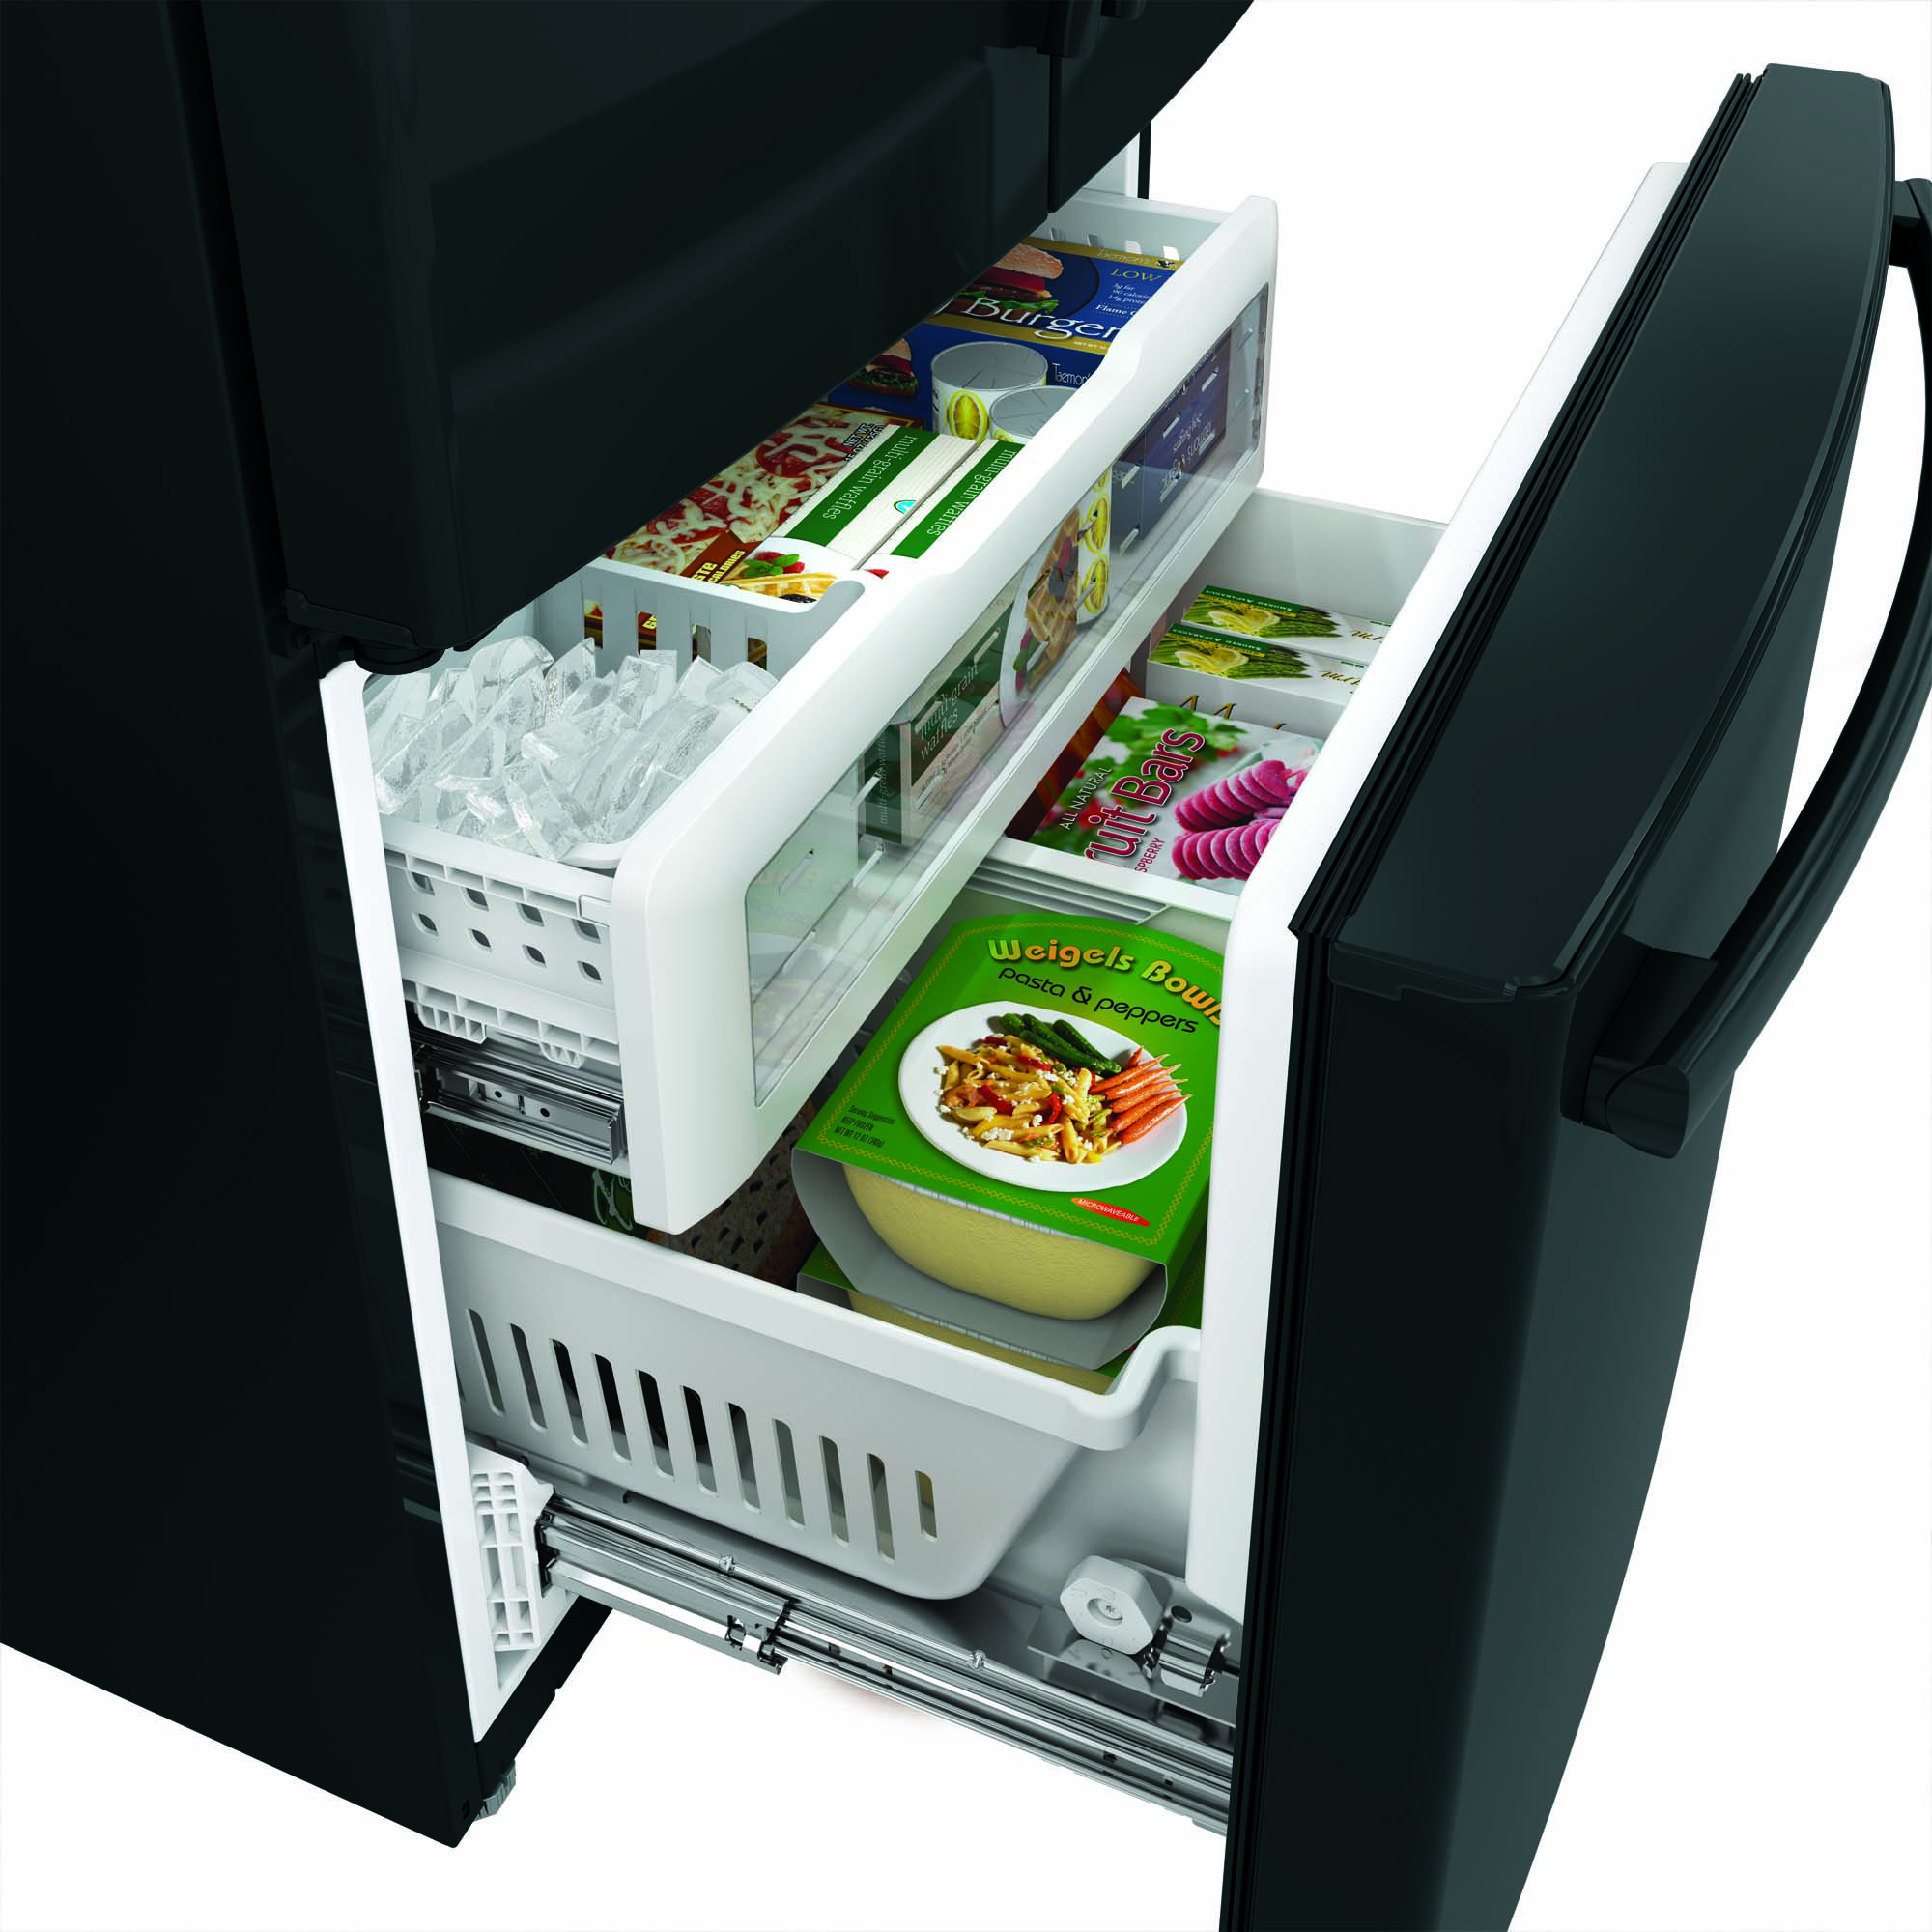 GE Appliances GNE29GGHBB 28.5 cu. ft. French-Door Refrigerator - Black